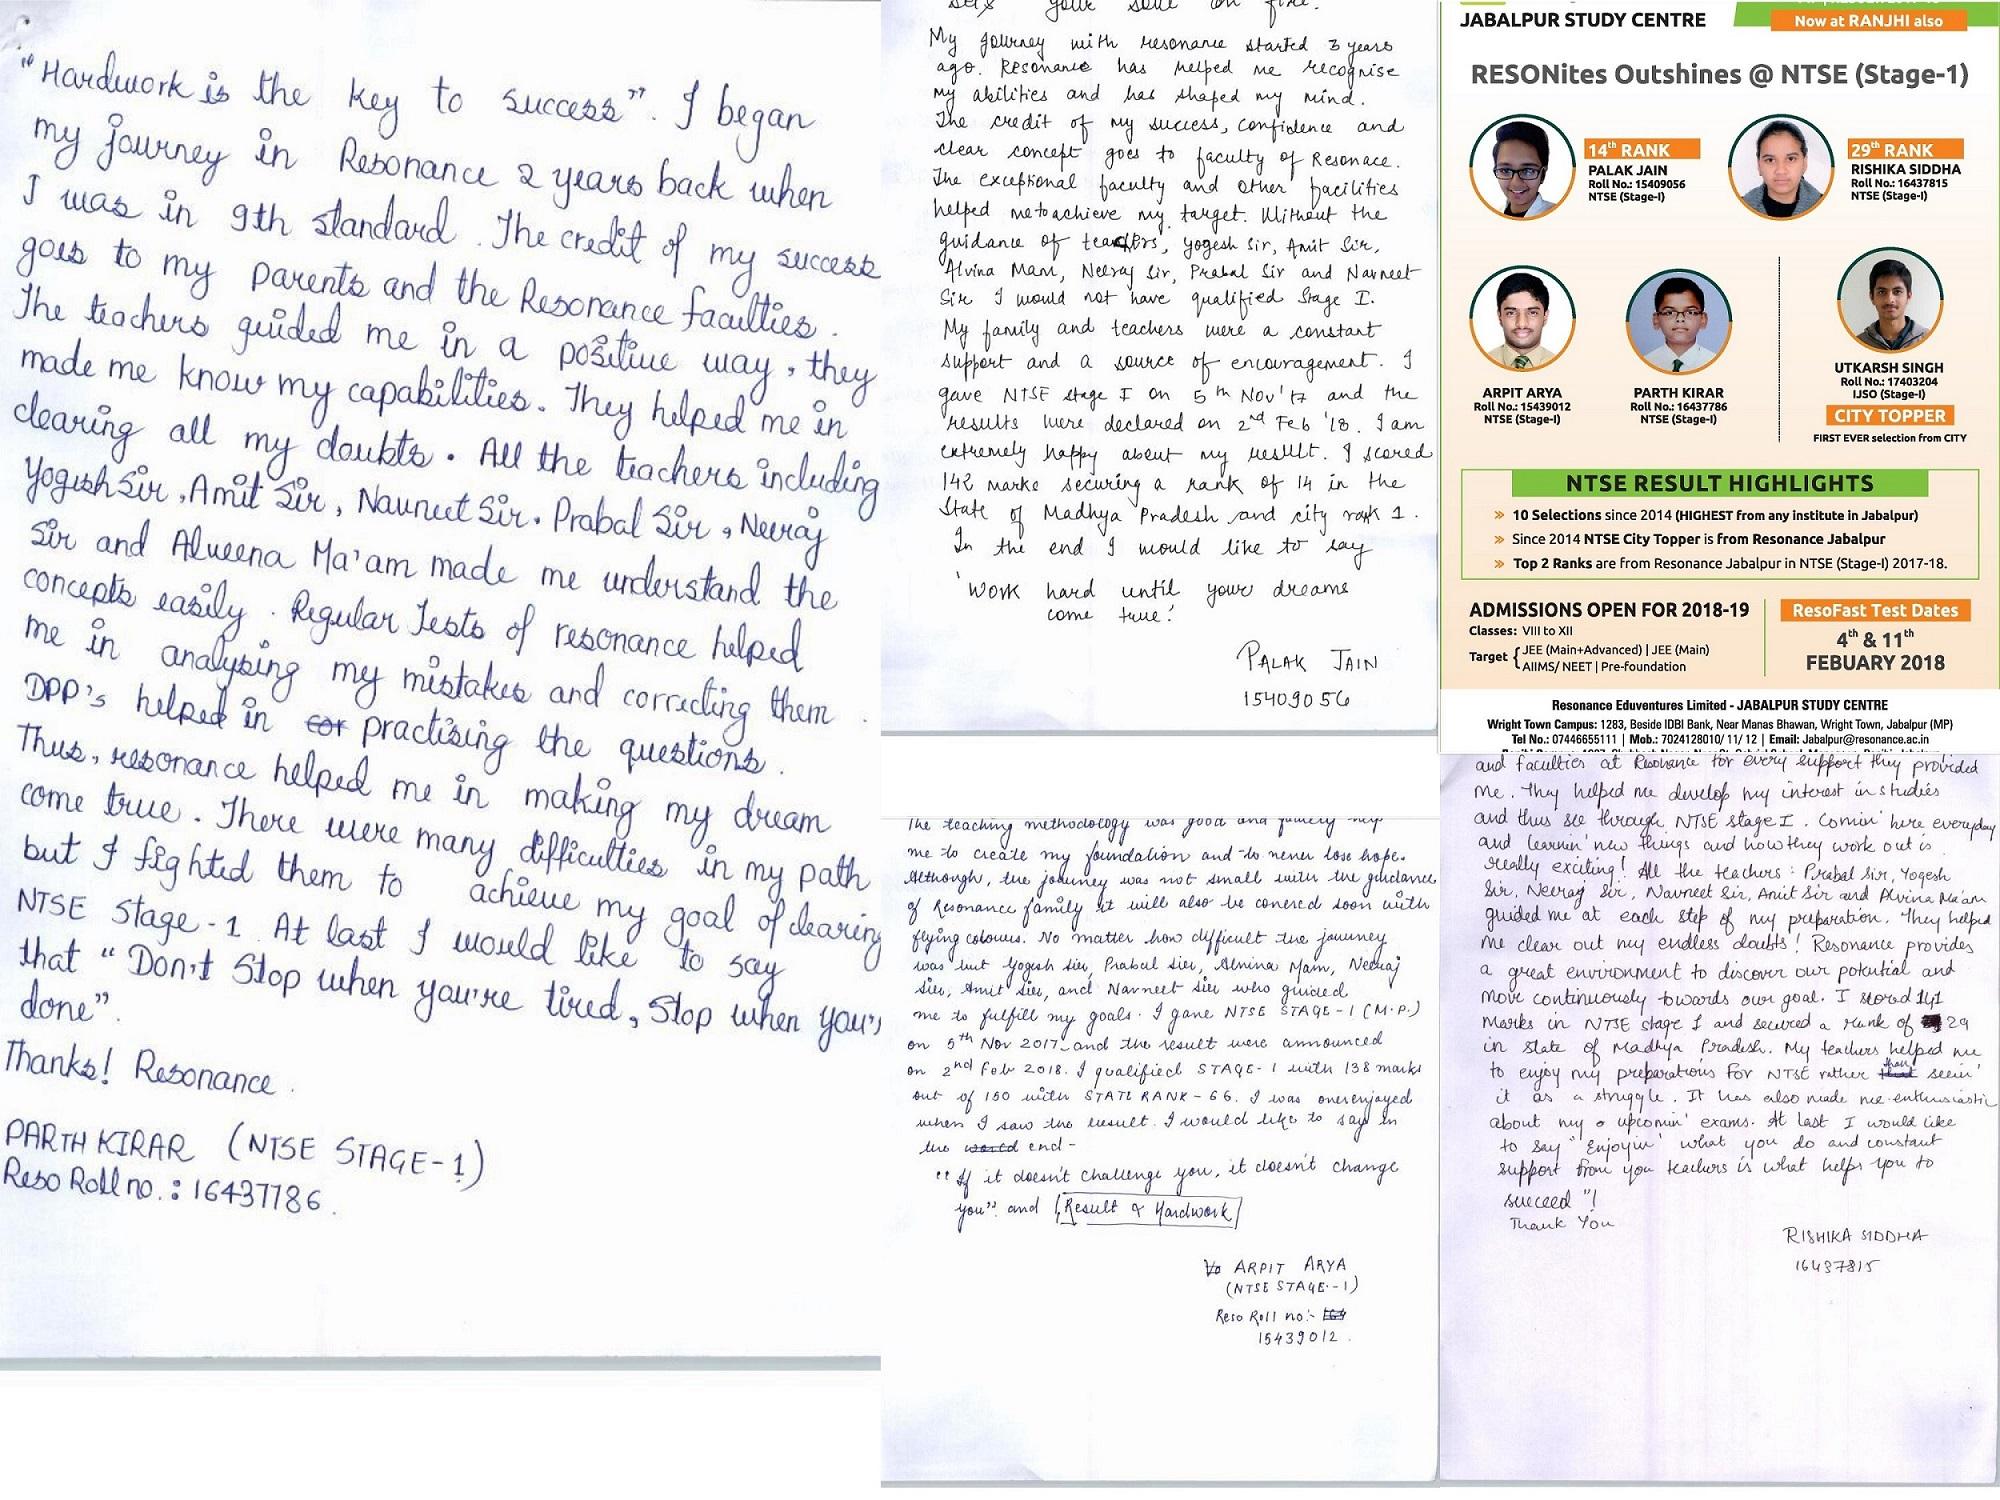 NTSE qualified student testimonial